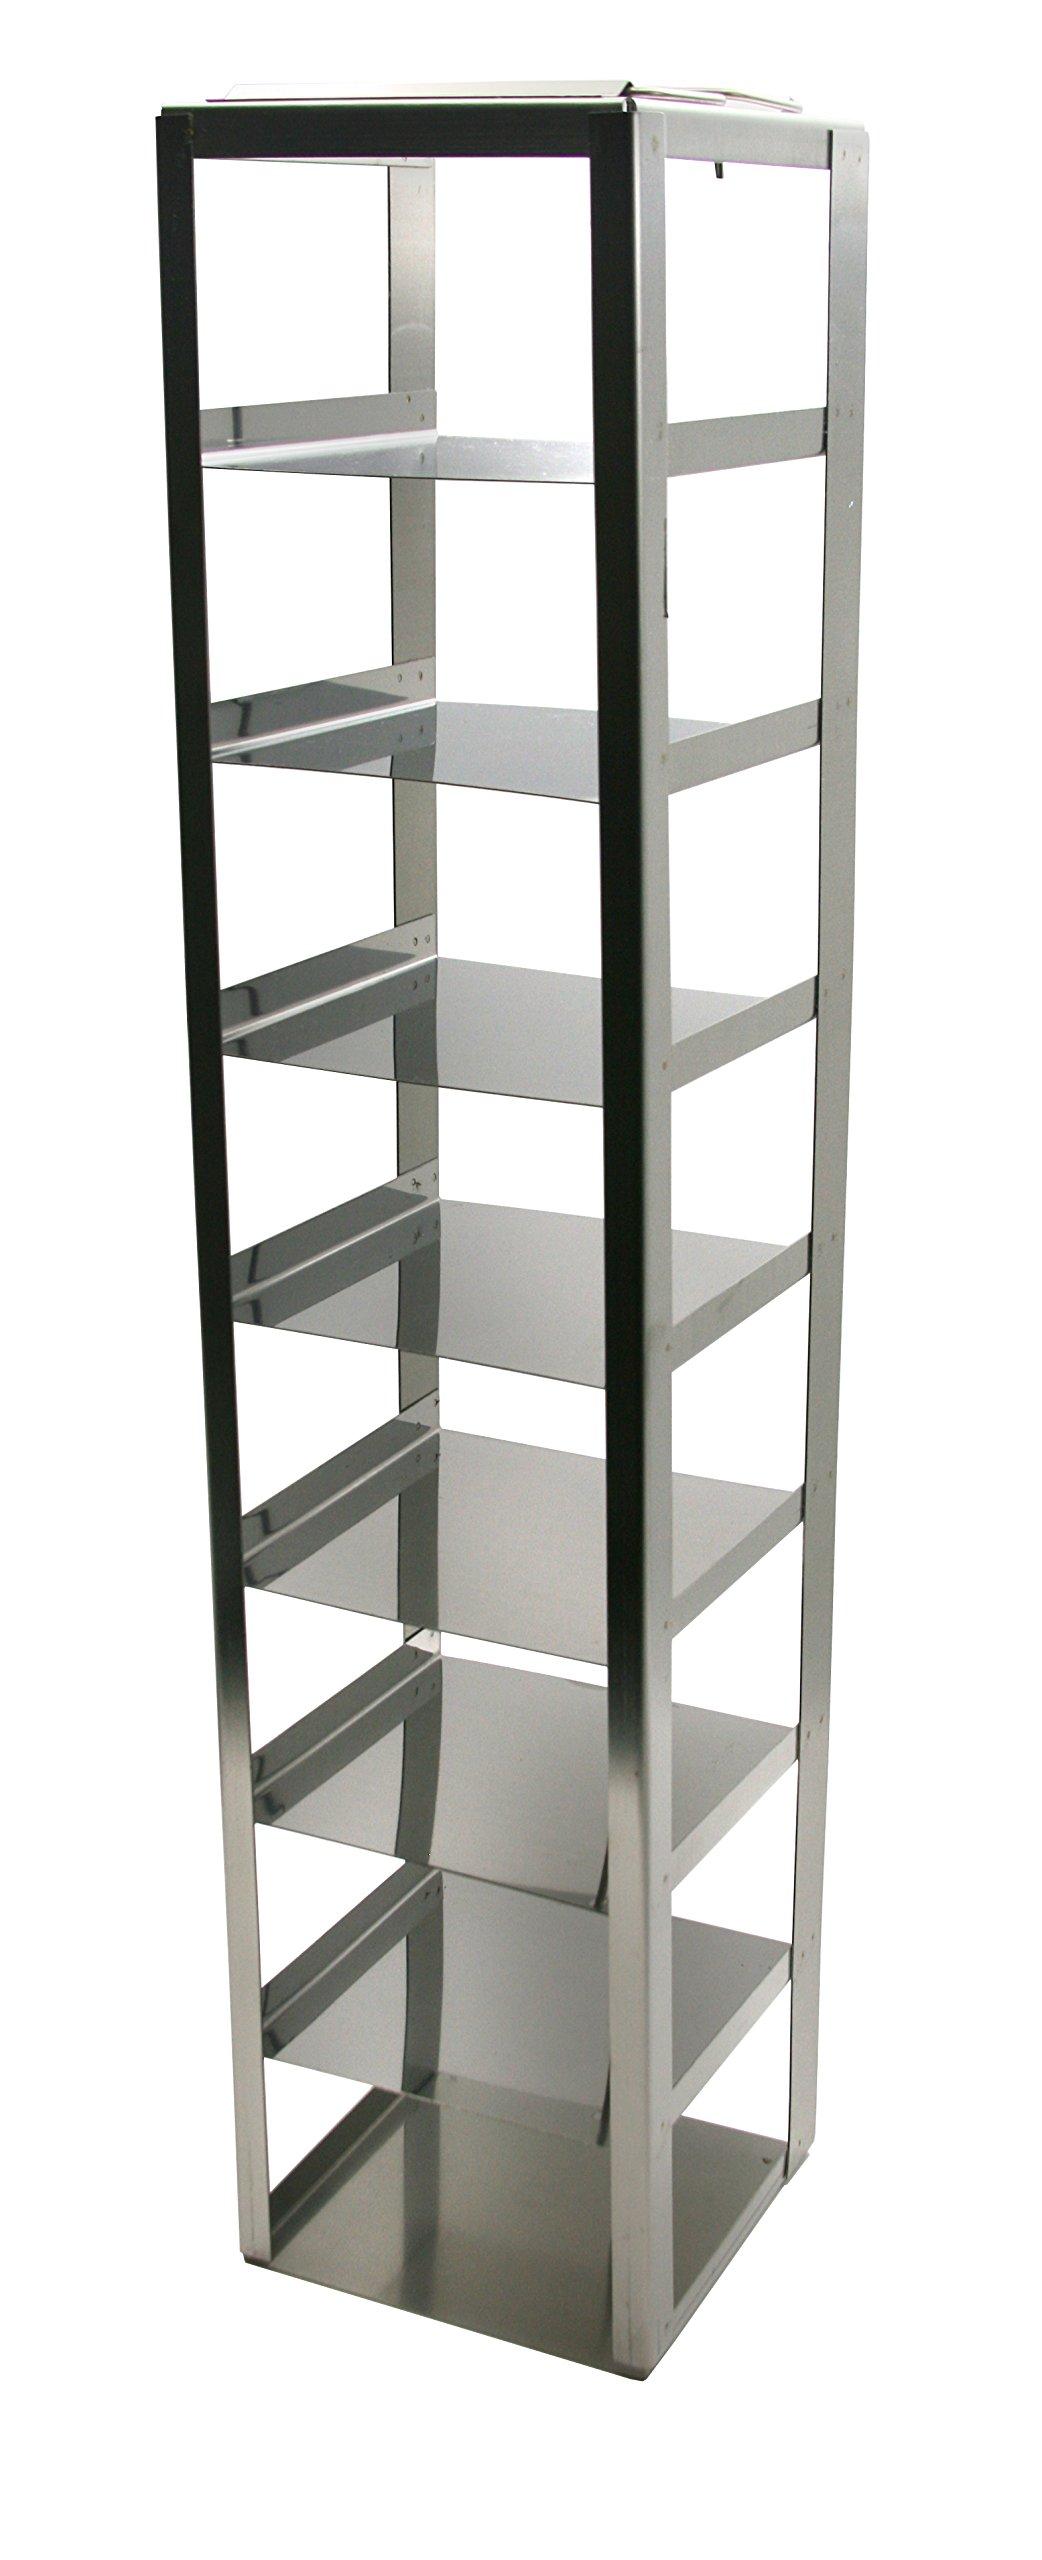 Heathrow Scientific HD2862D Steel Standard Chest Freezer Vertical Rack with 8 Shelves, For 3'' Box Height